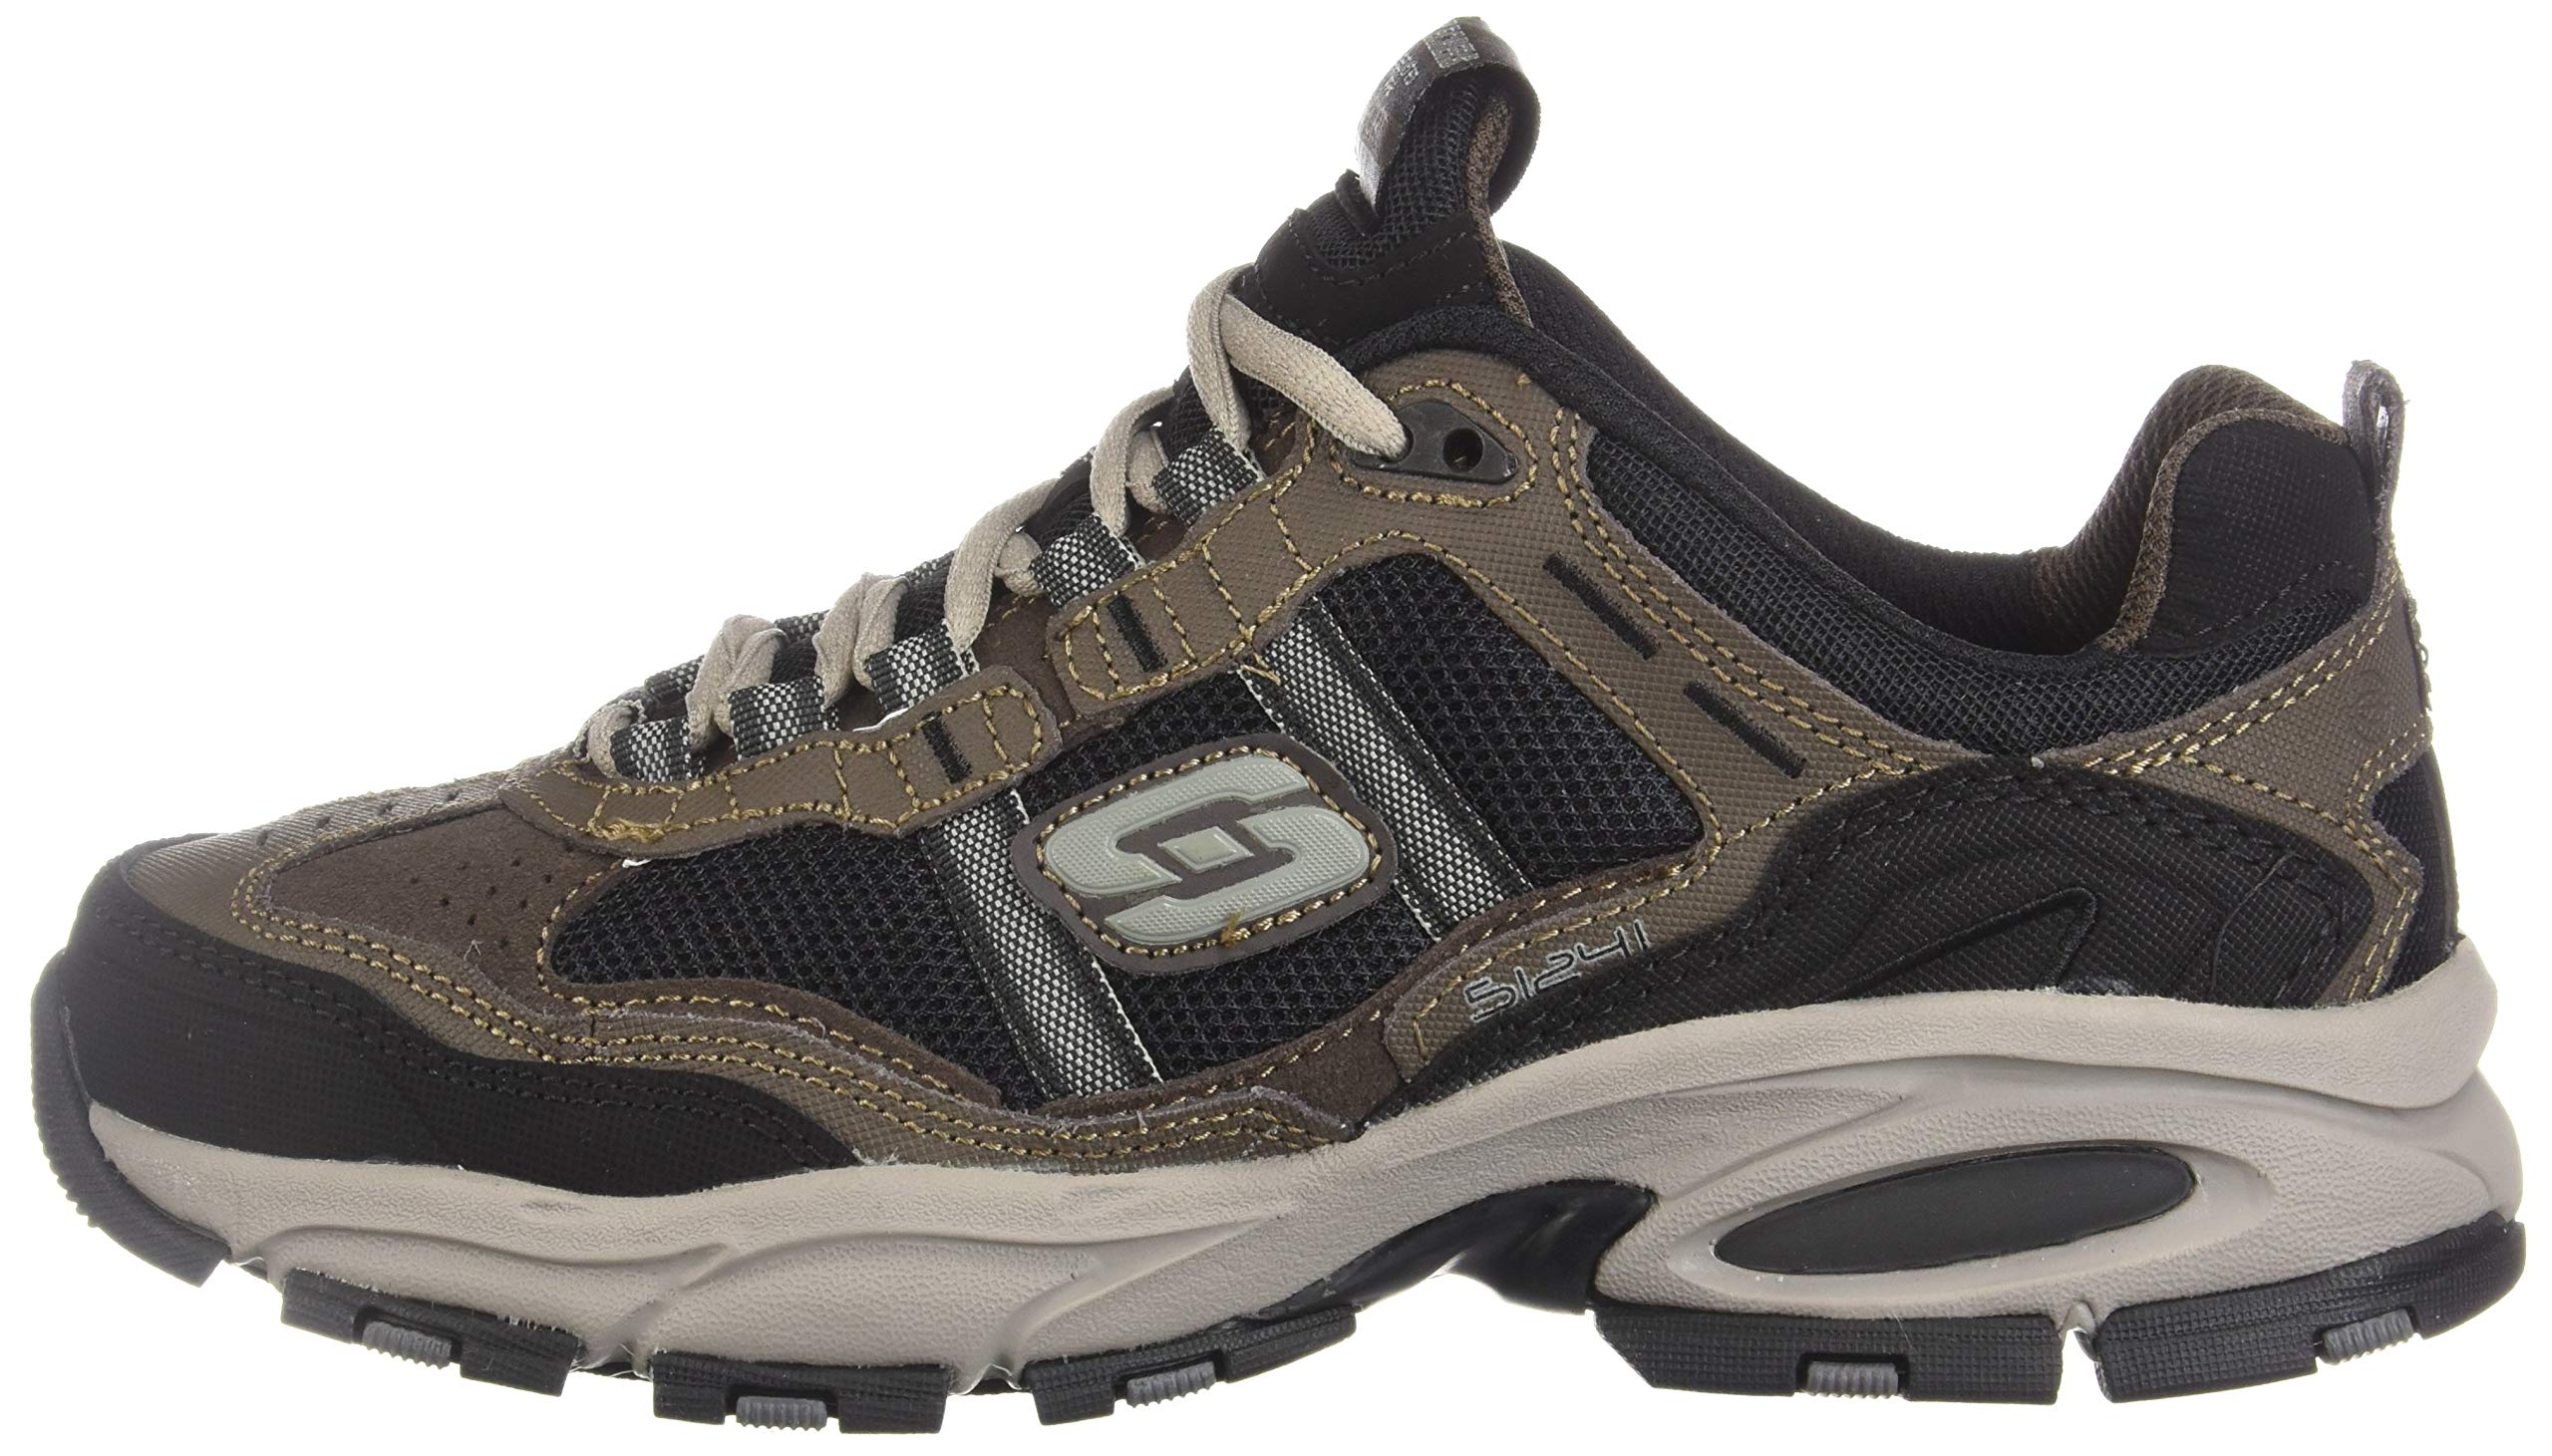 Skechers Sport Men's Vigor 2.0 Trait Memory Foam Sneaker, Brown/Black, 7 M US by Skechers (Image #5)